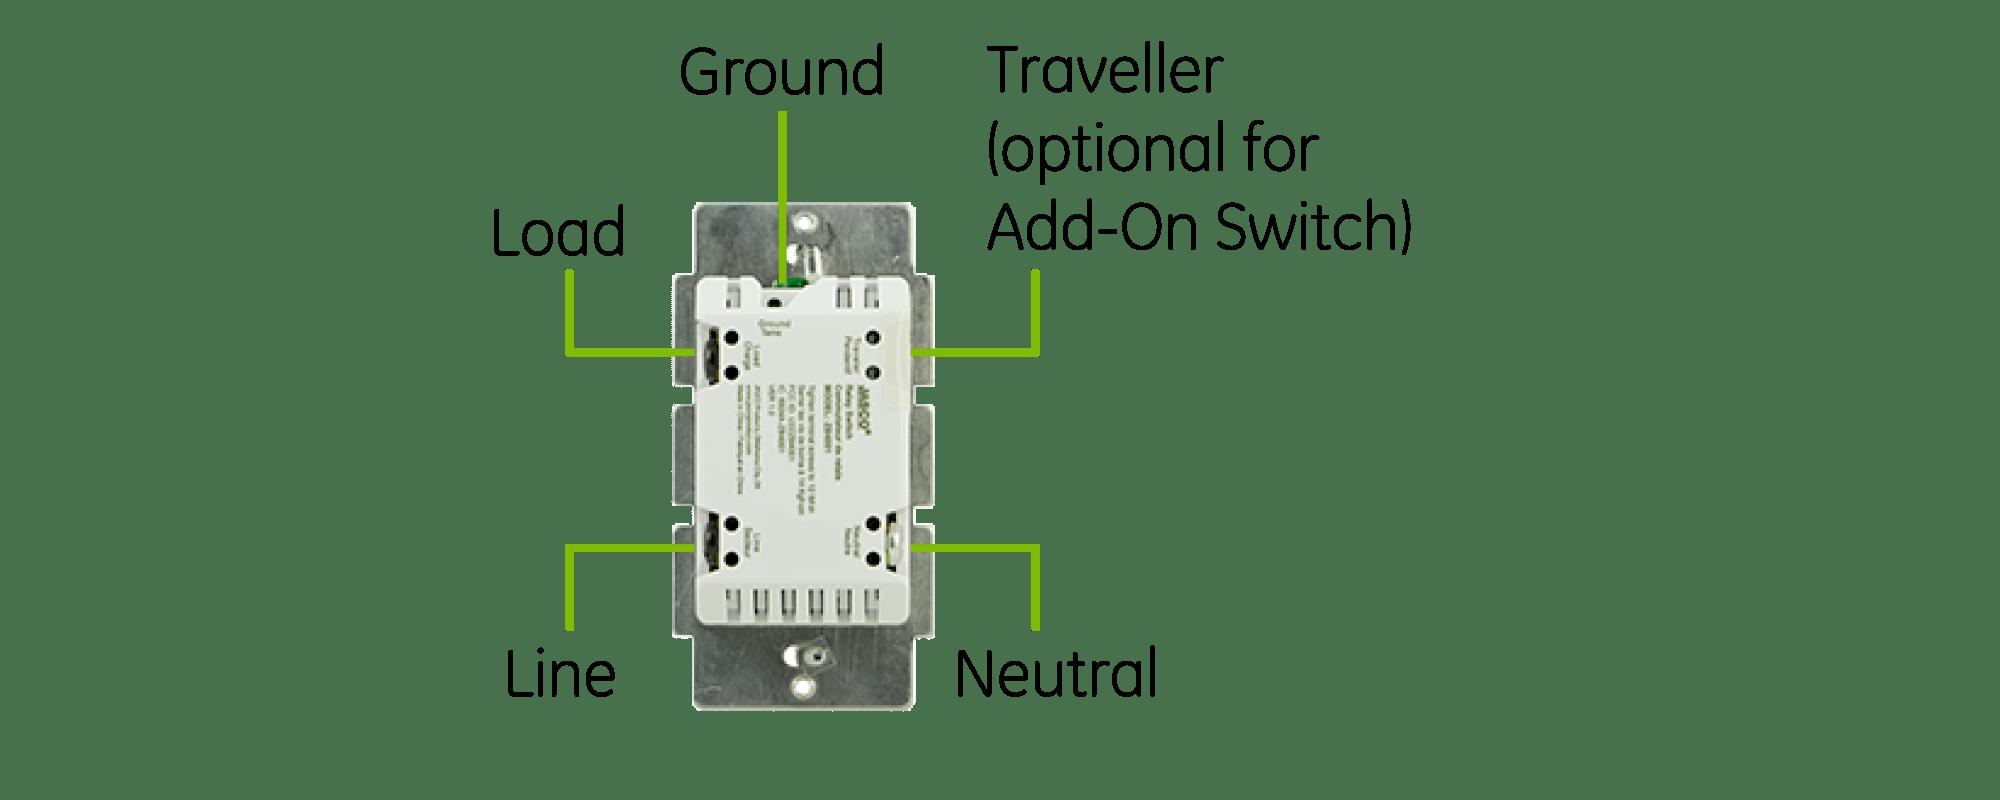 Dimmer Switch Wiring Diagram Mazda Auto Electrical Trigaroutfur Ge Z Headlight